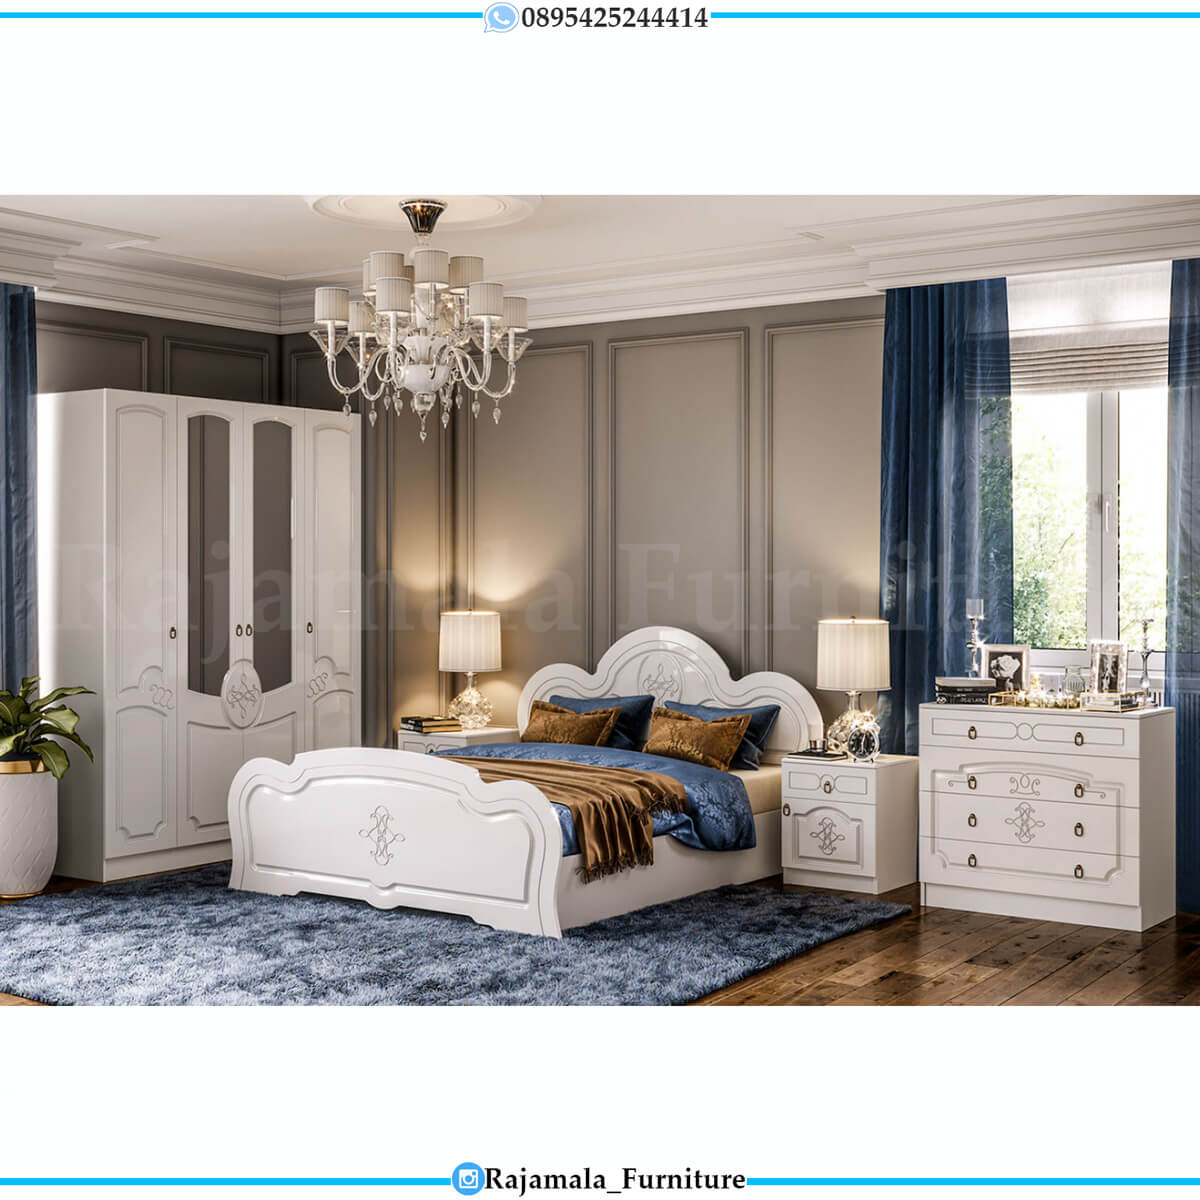 Dipan Mewah Minimalis Putih Bedroom Set Luxury Color RM-0230